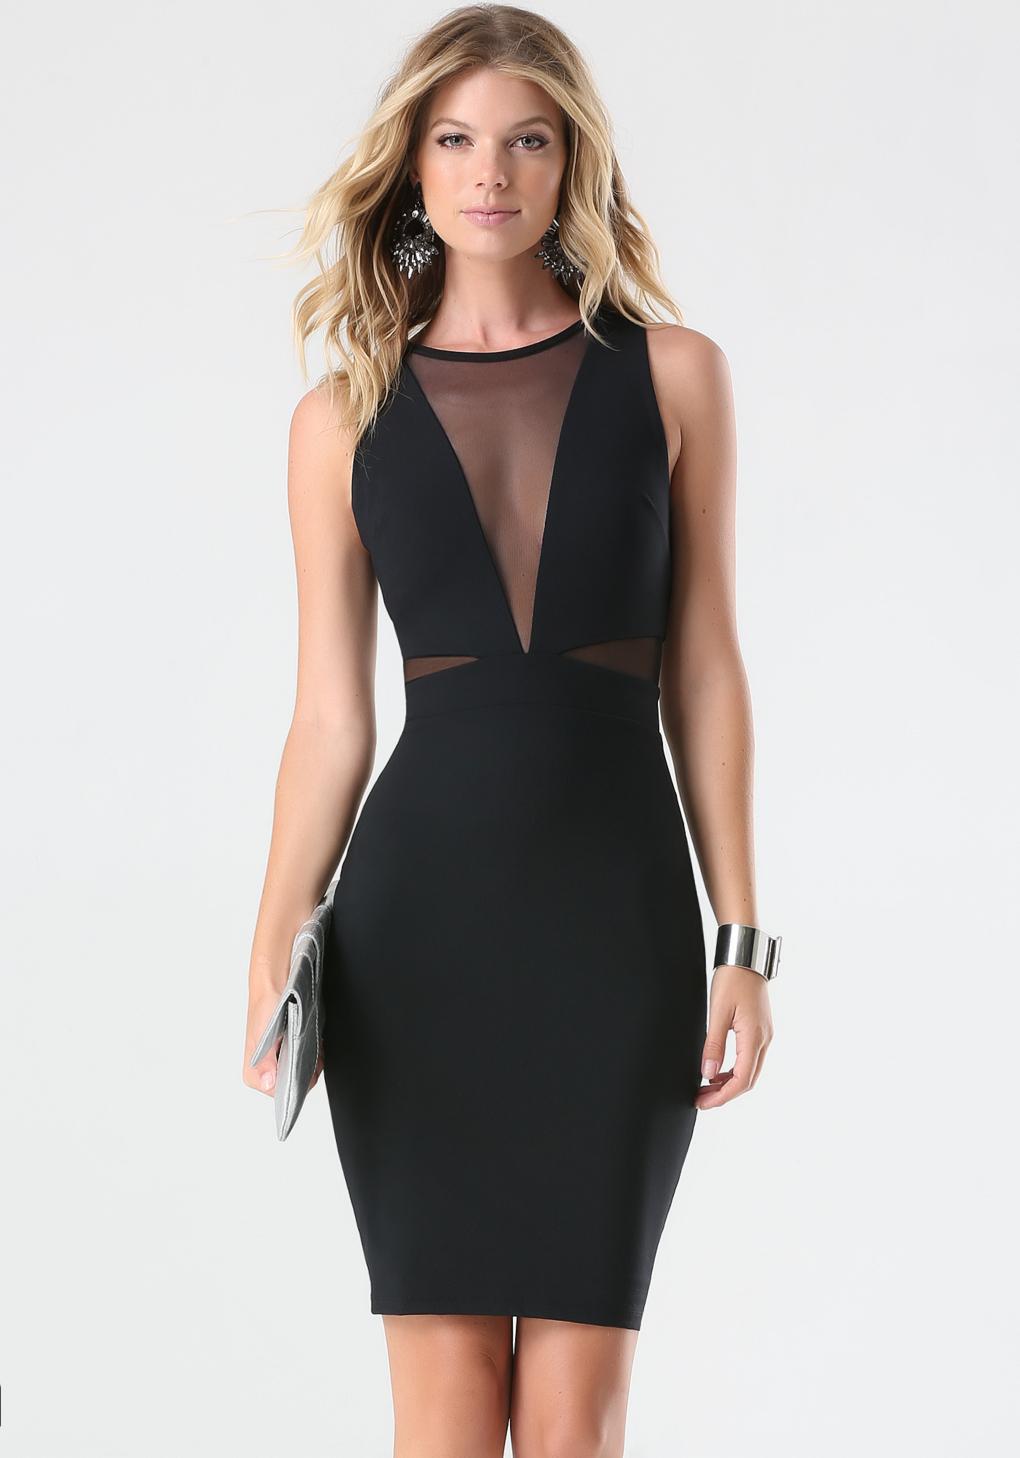 Deep V Neck Dresses | Maxi Dress Plunging Neckline | Plunging Neckline Dress